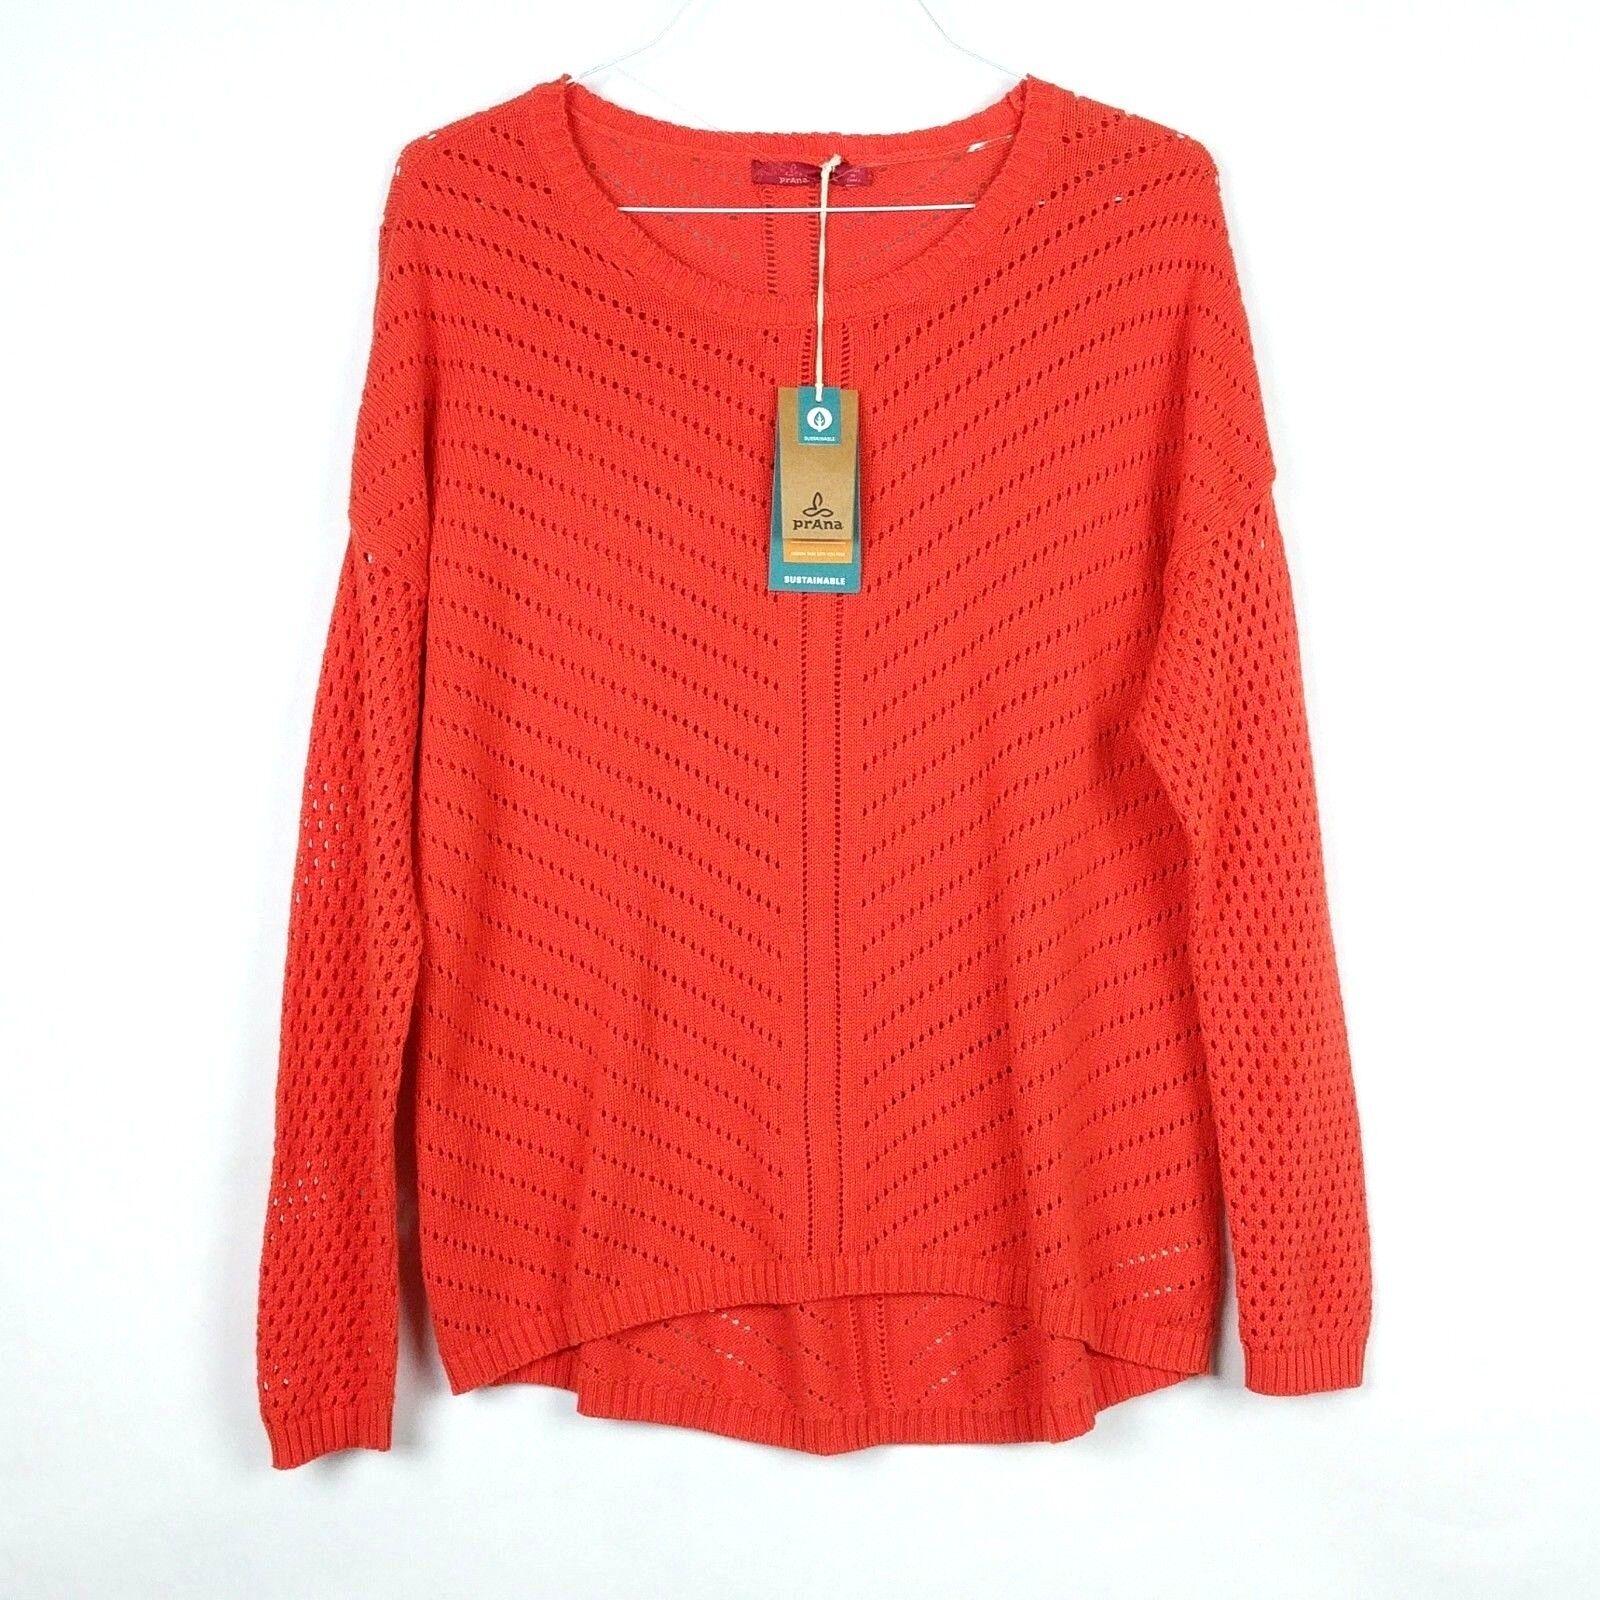 NWT Prana Womens Large Sweater Parker orange Koi Knit Organic Cotton Long Sleeve